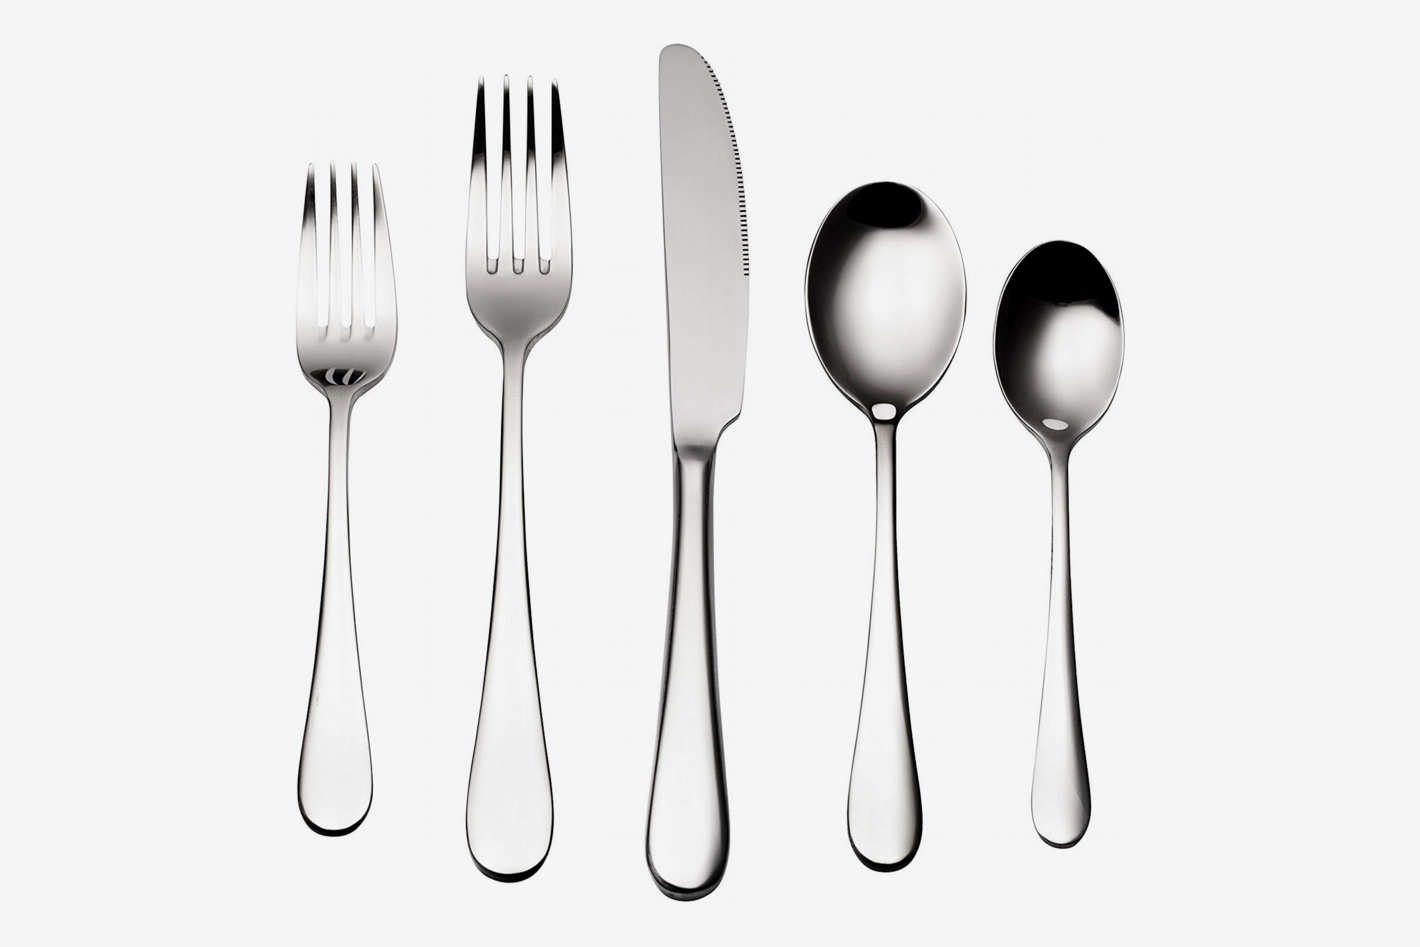 bruntmor silver 18/10 flatware set for eight people